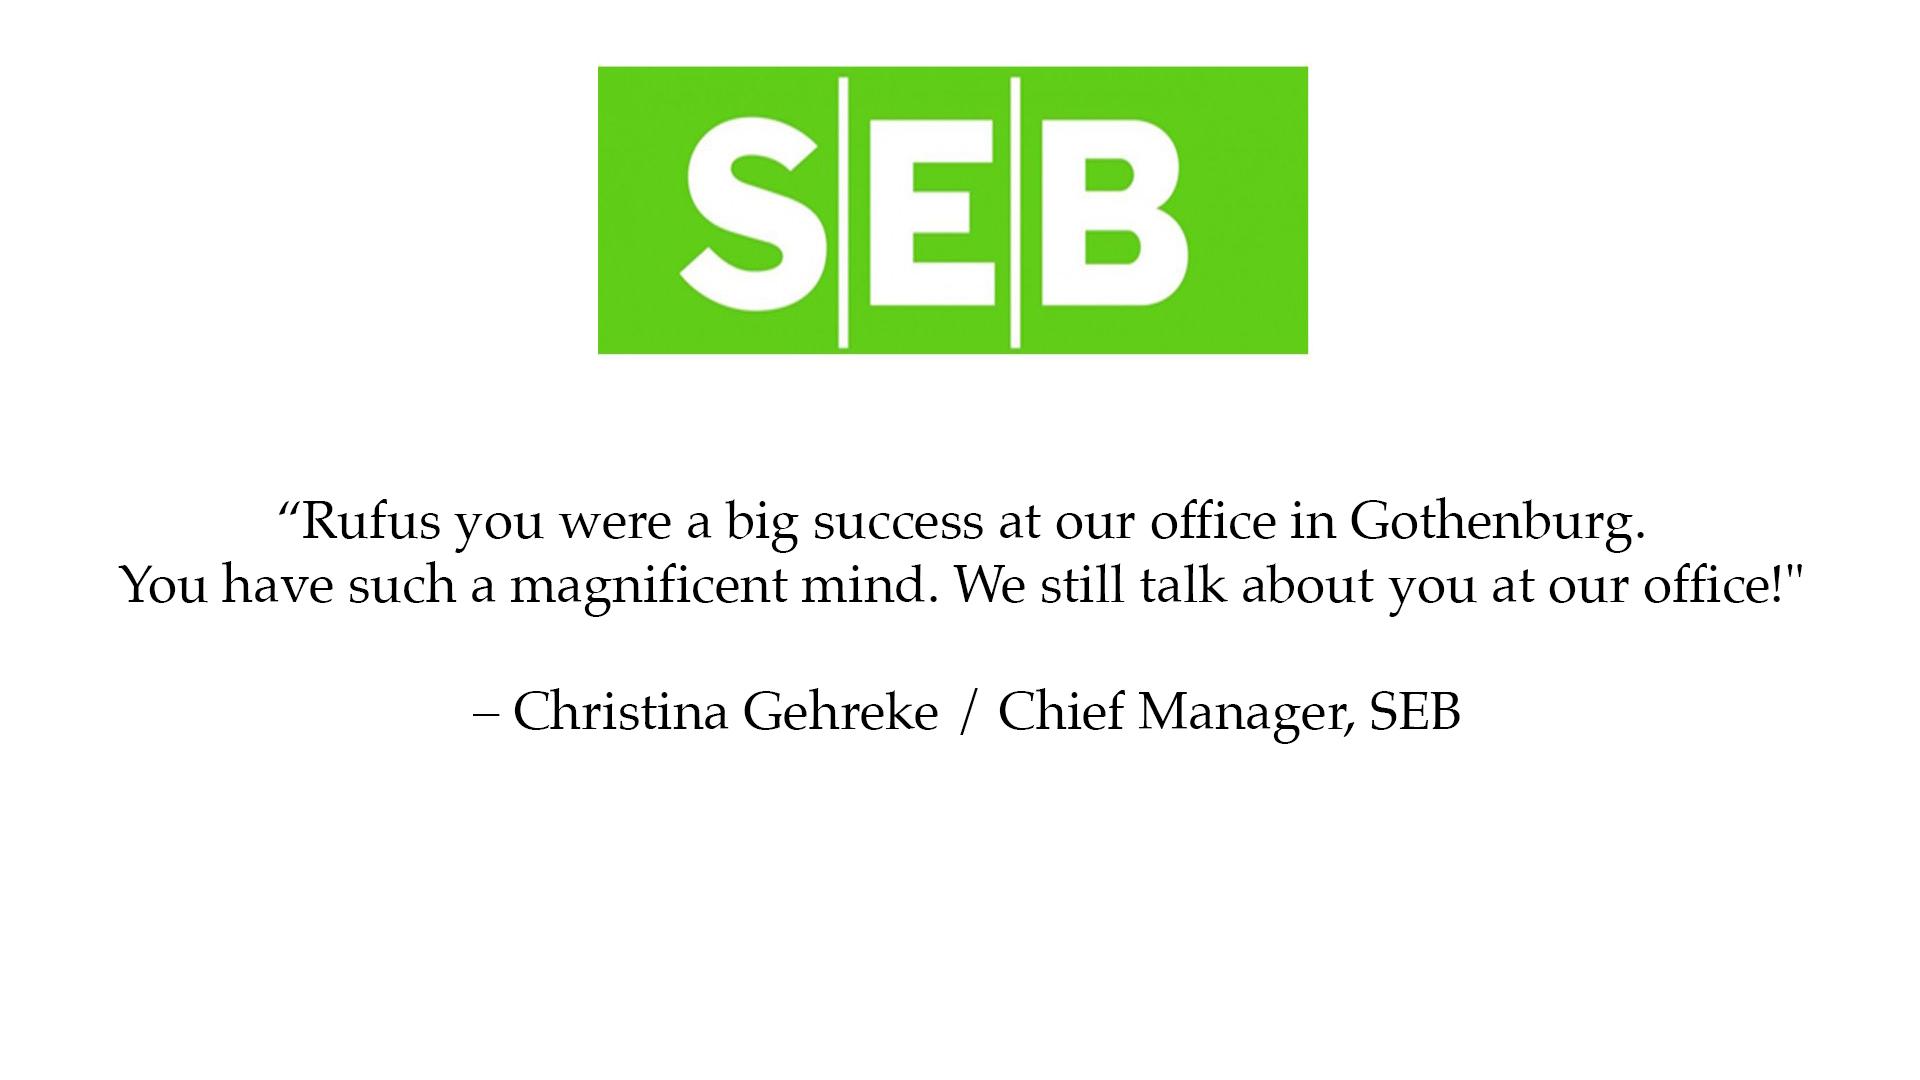 SEB Reference.jpg